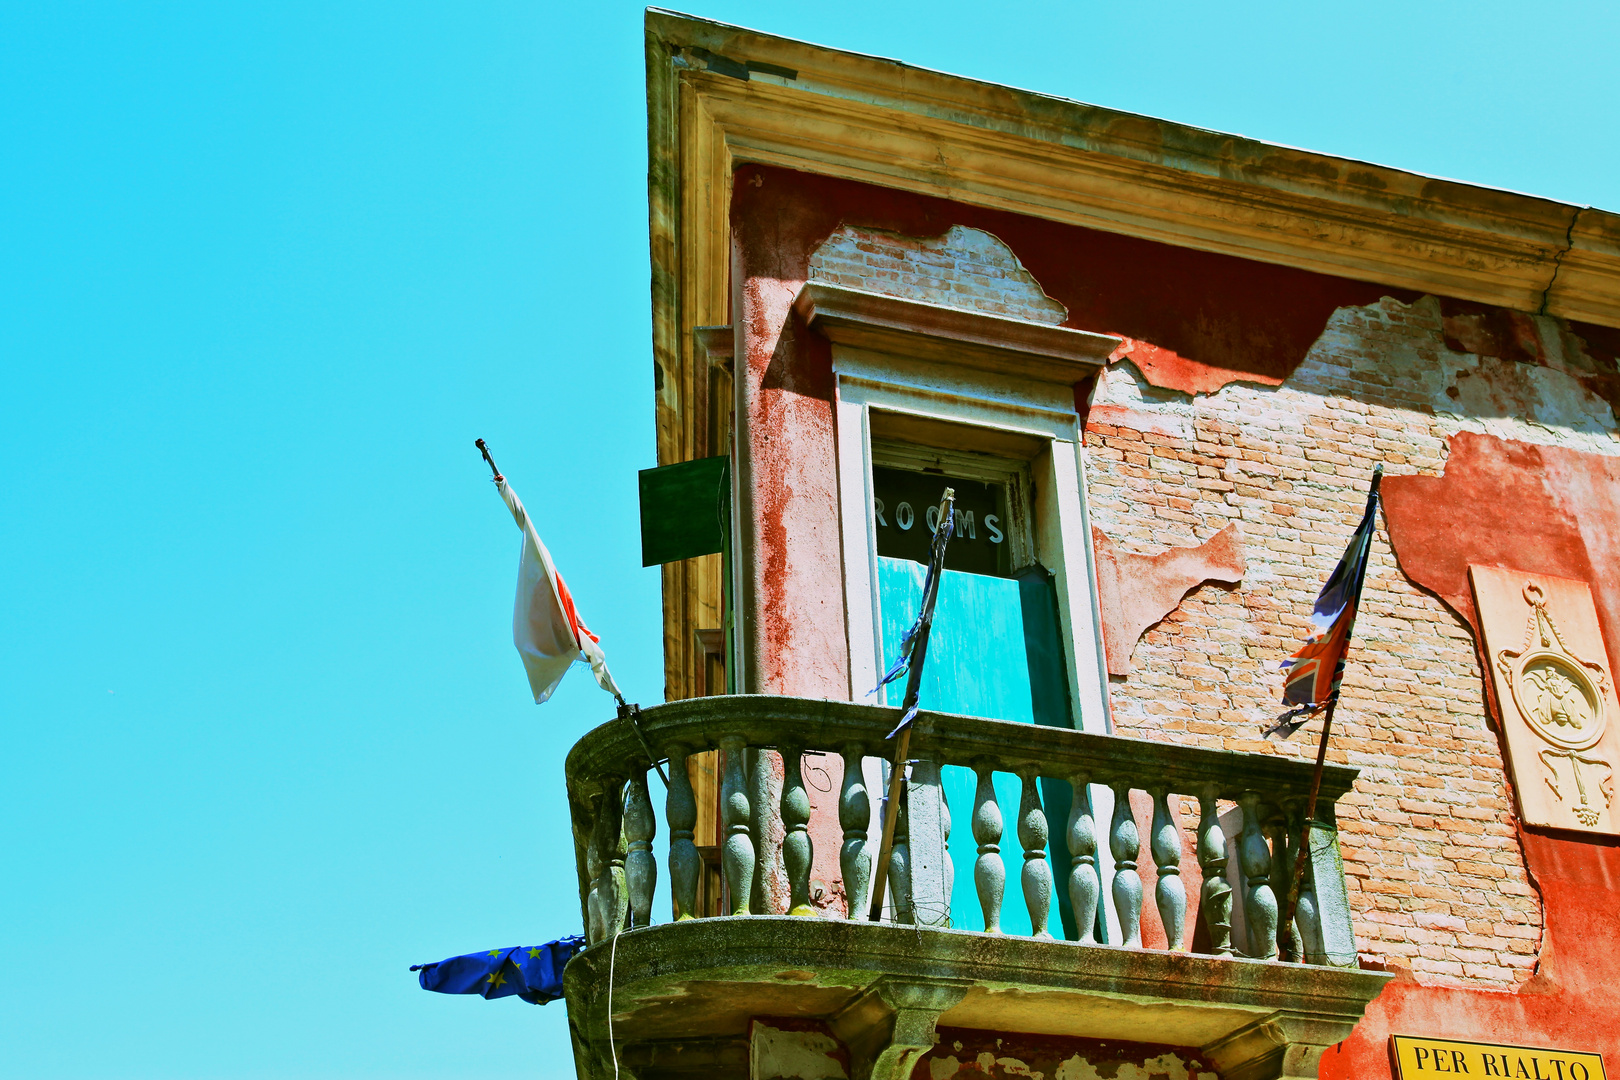 Rooms in Venice